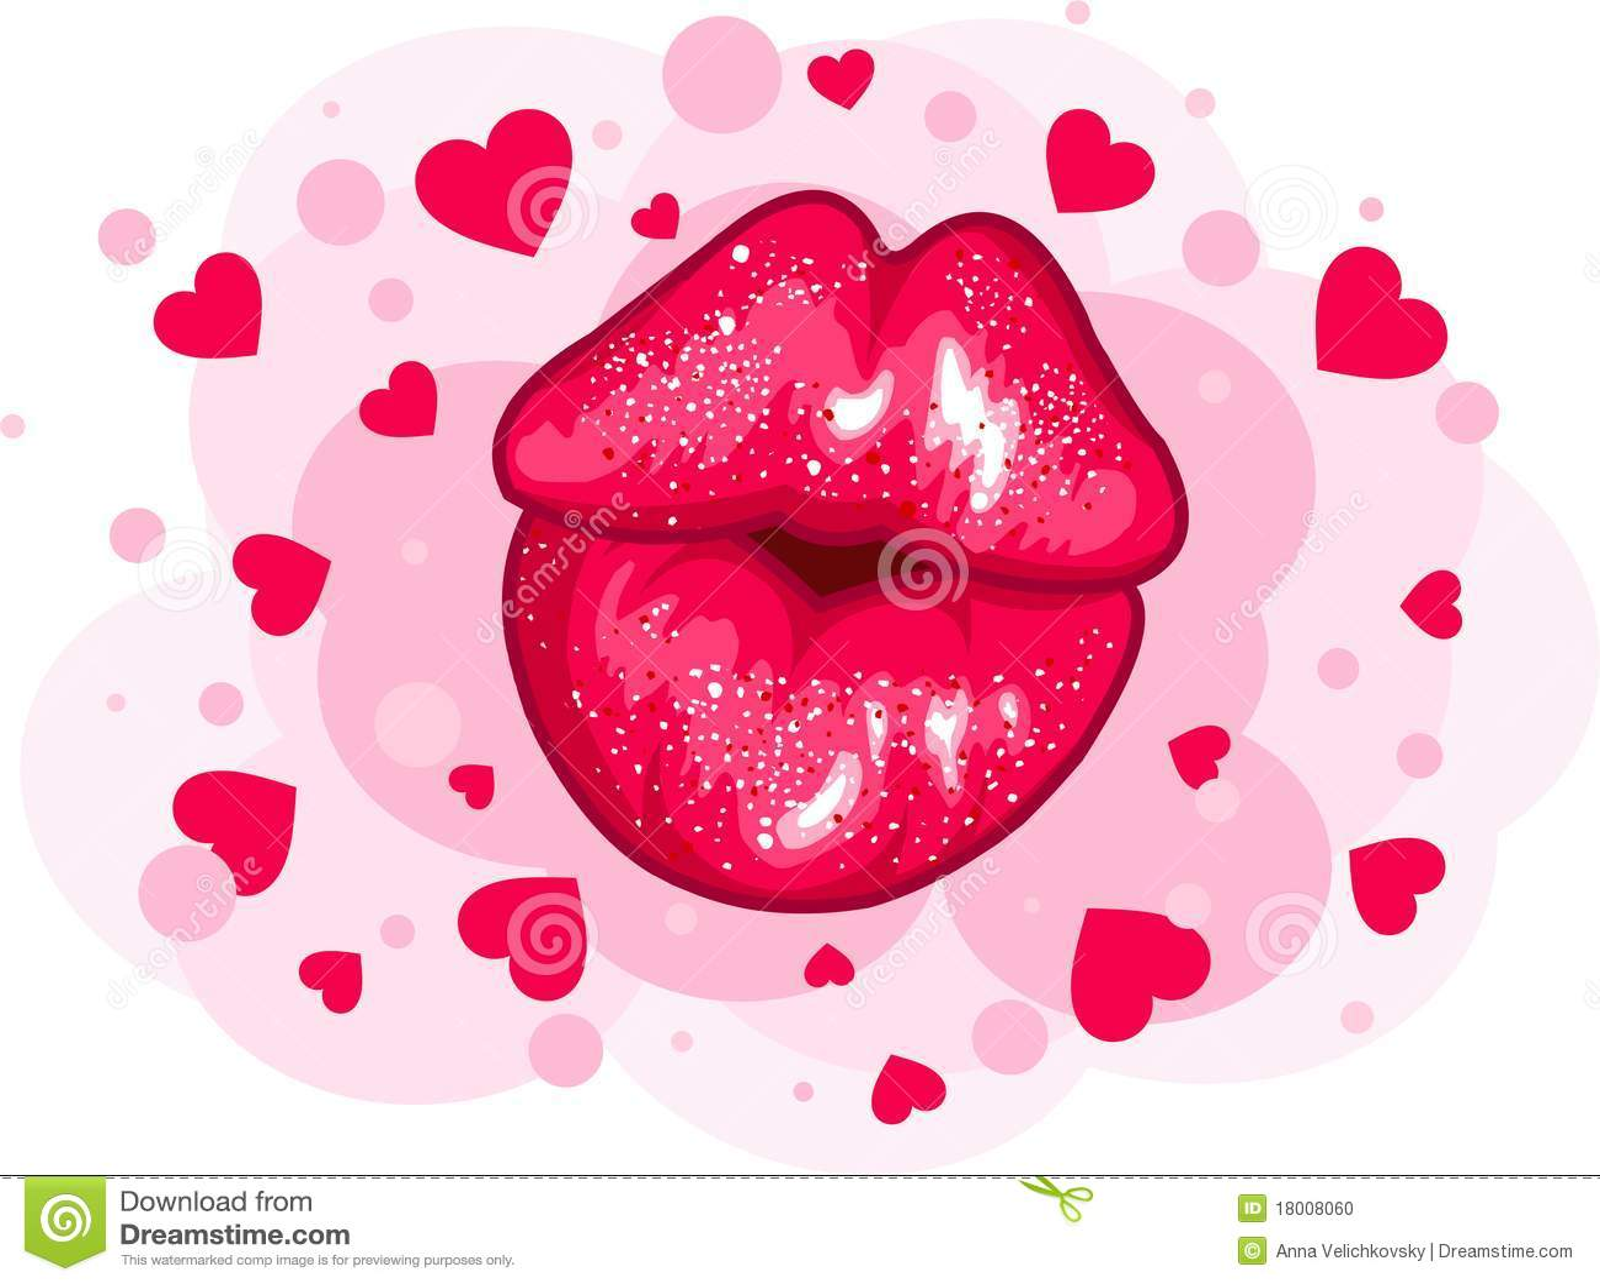 Love kiss design stock photo image 18008060 for I love to design